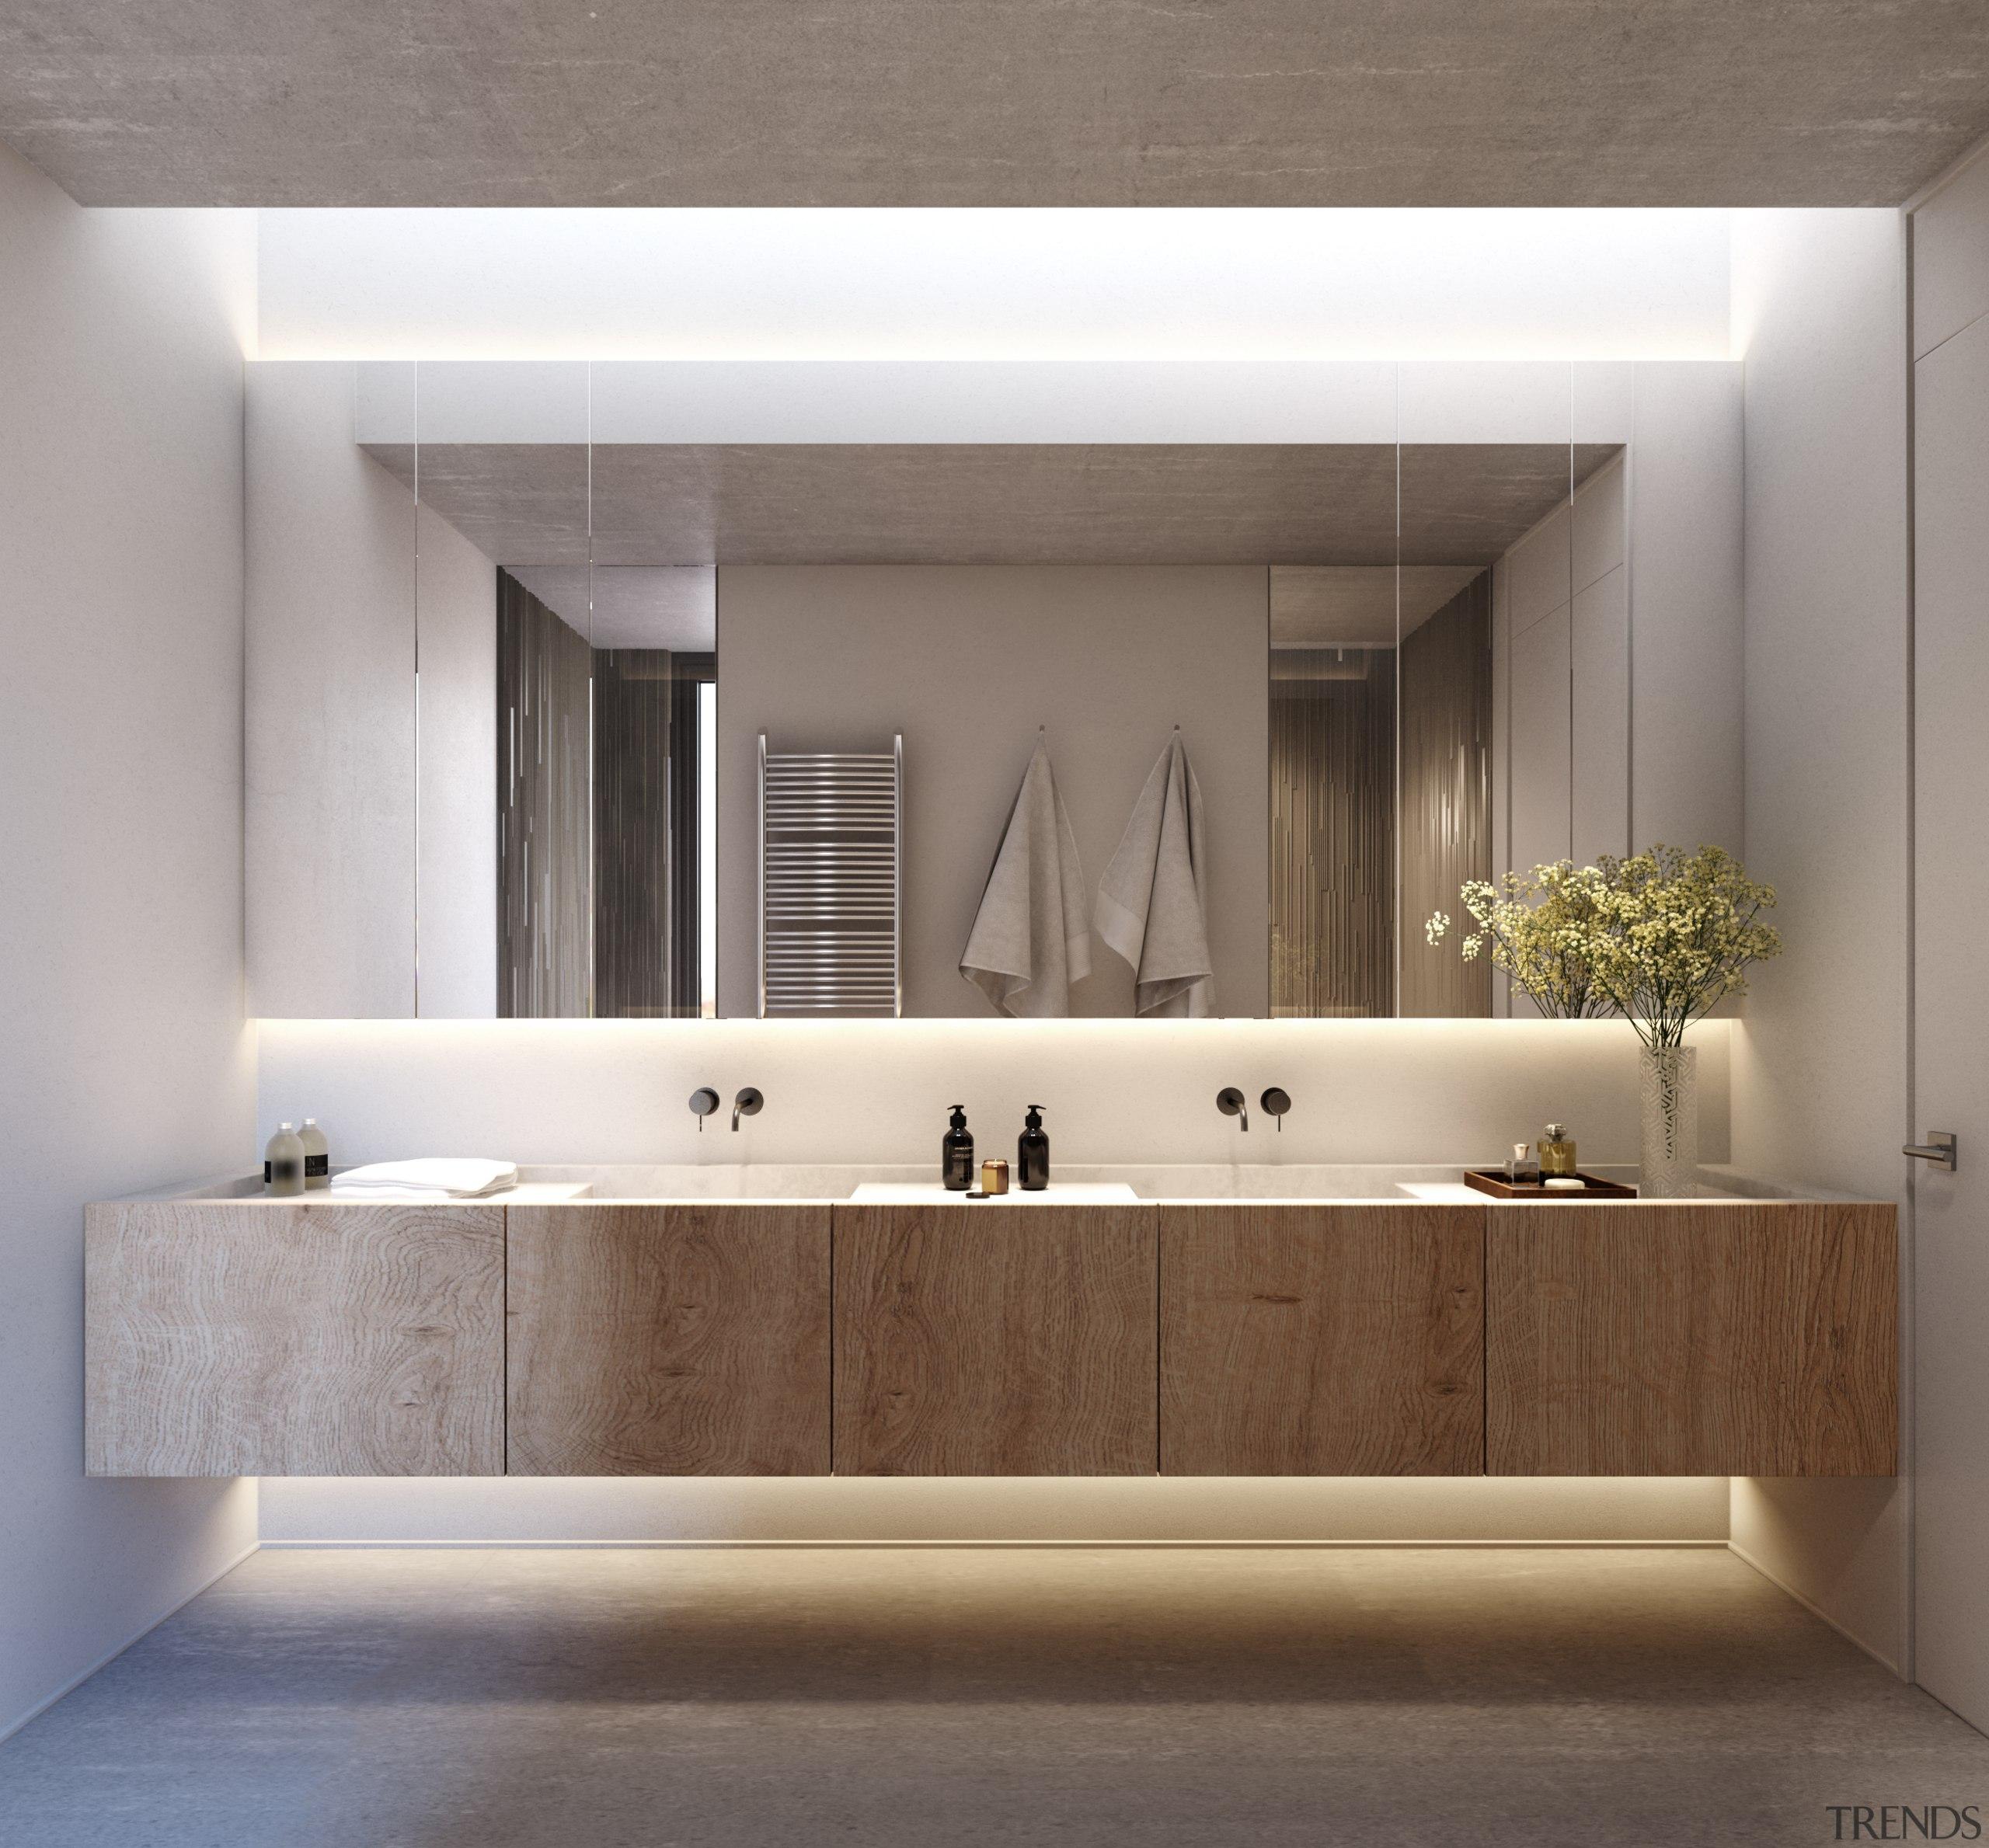 Island life – Bathroom - architecture | bathroom architecture, bathroom, bathroom accessory, bathroom cabinet, floor, interior design, sink, tap, wall, gray